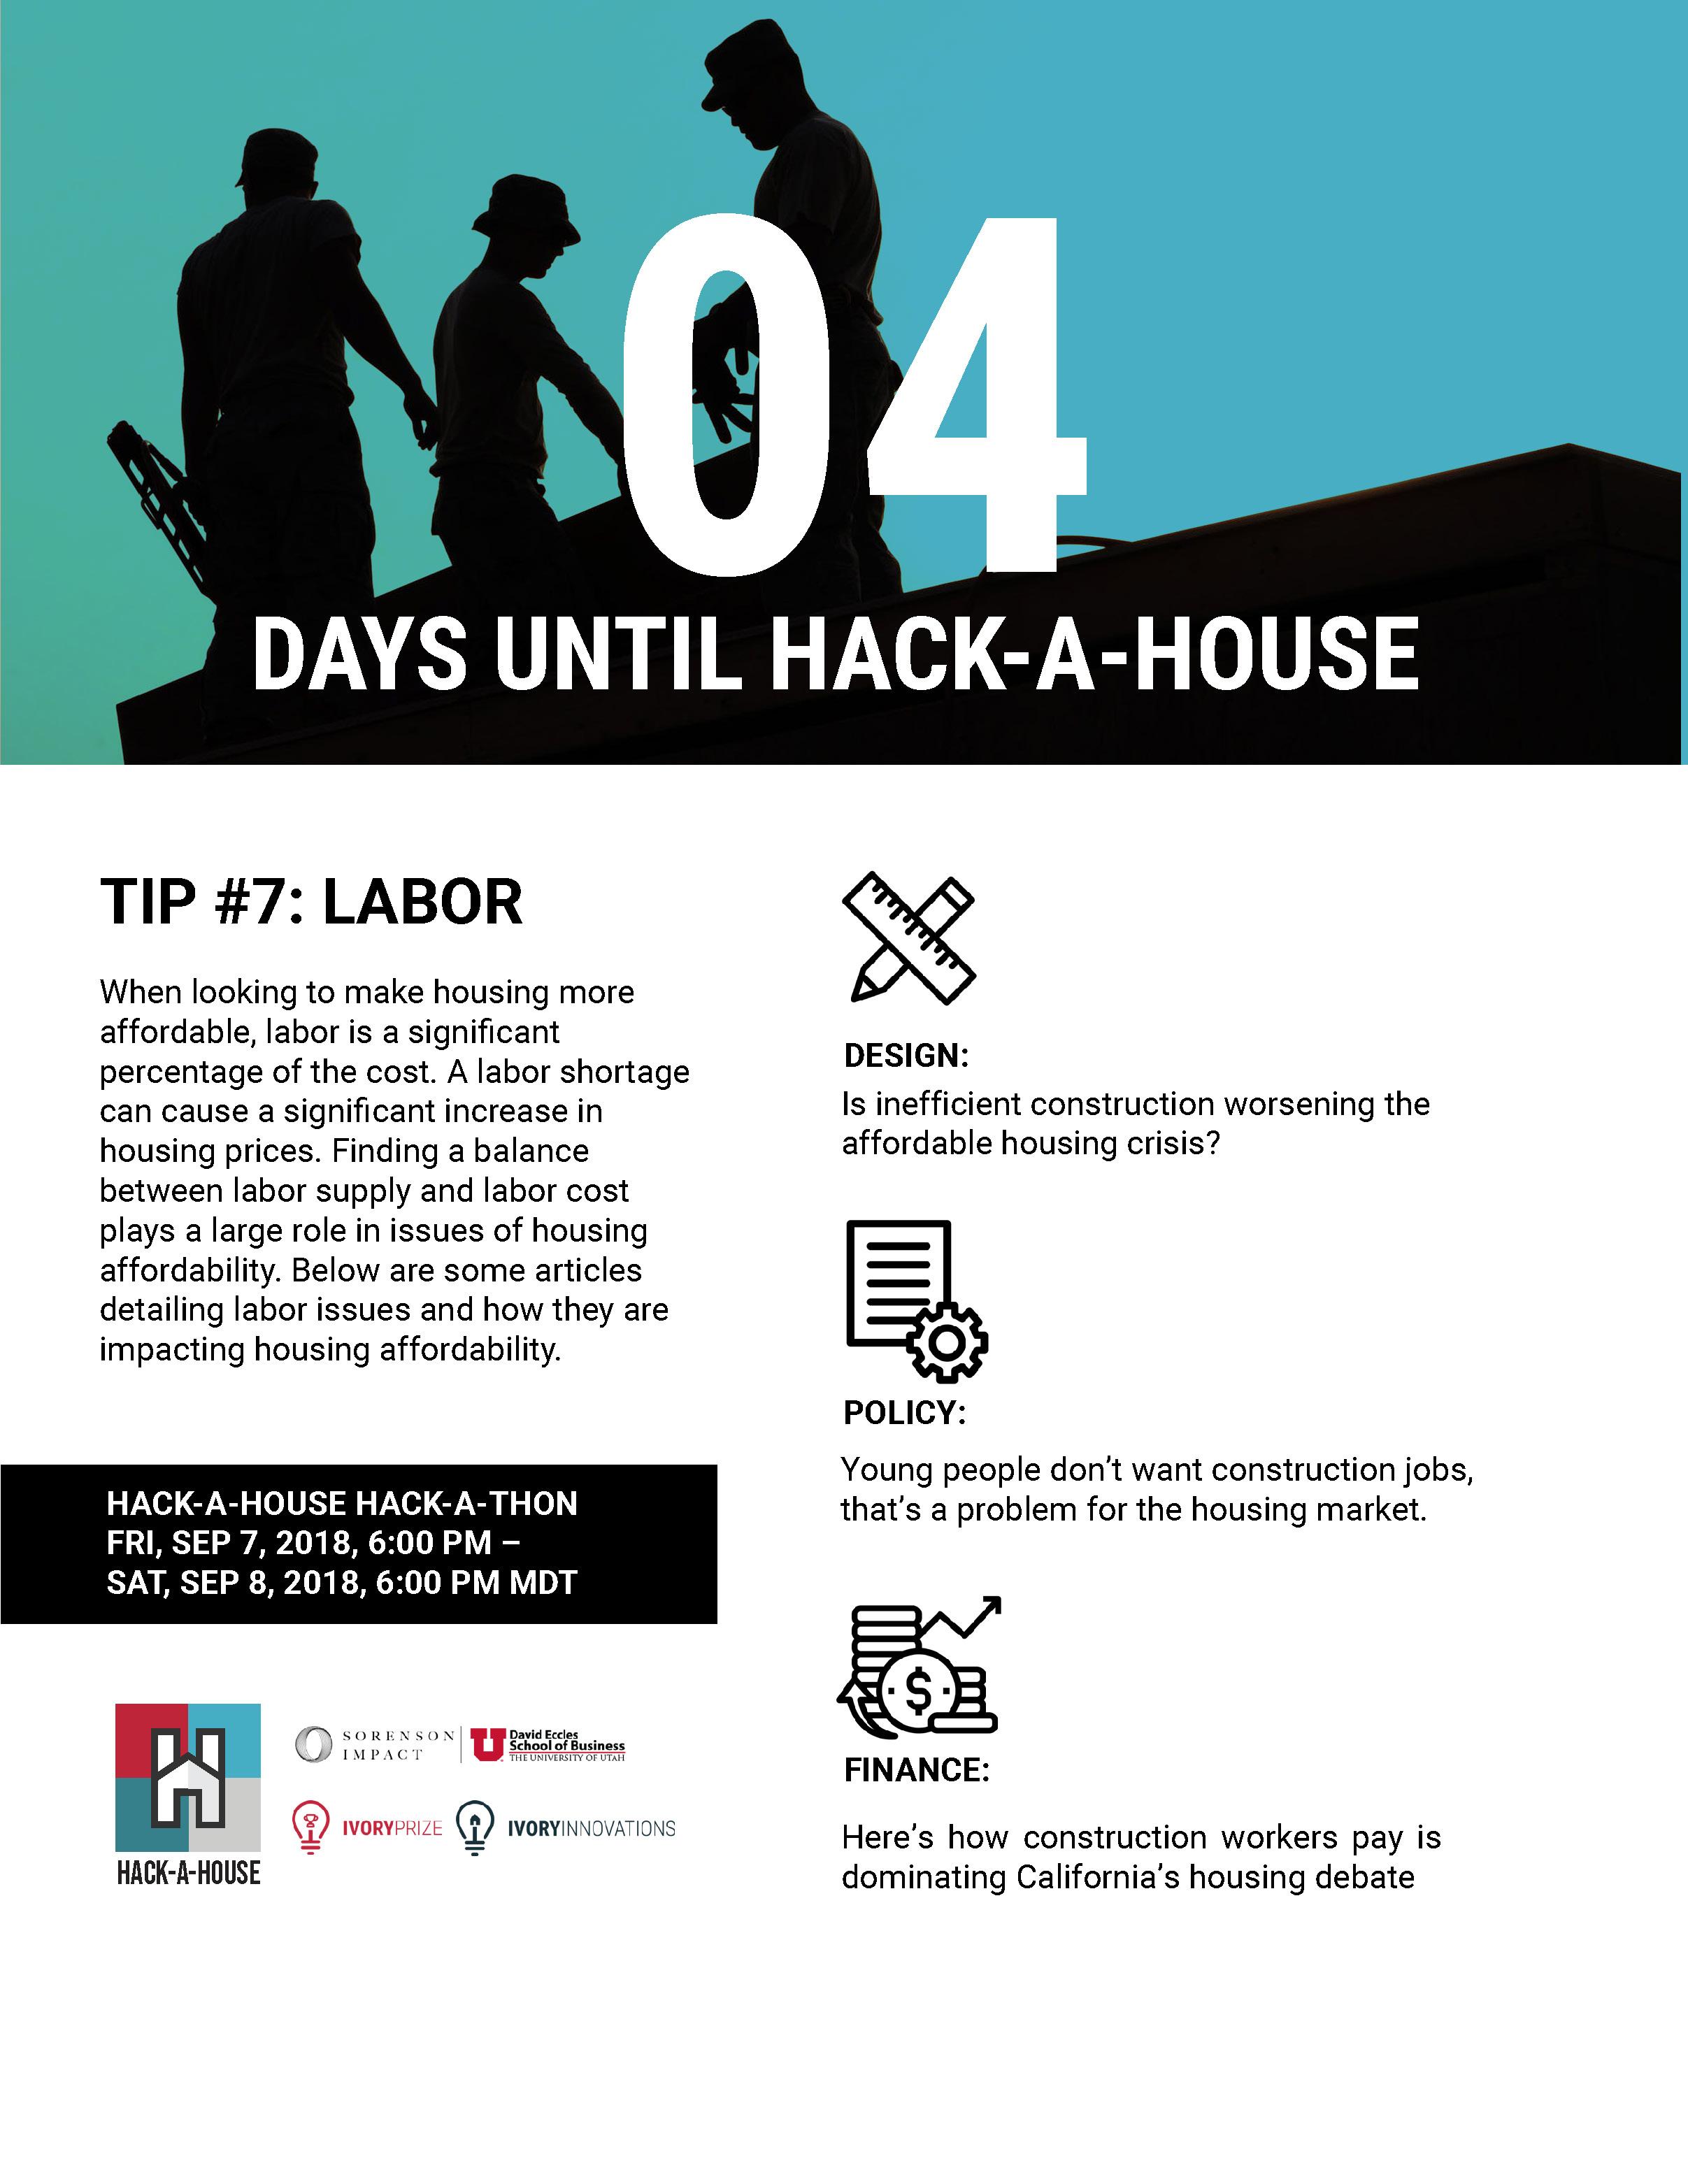 hack-a-house countdown_07.jpg